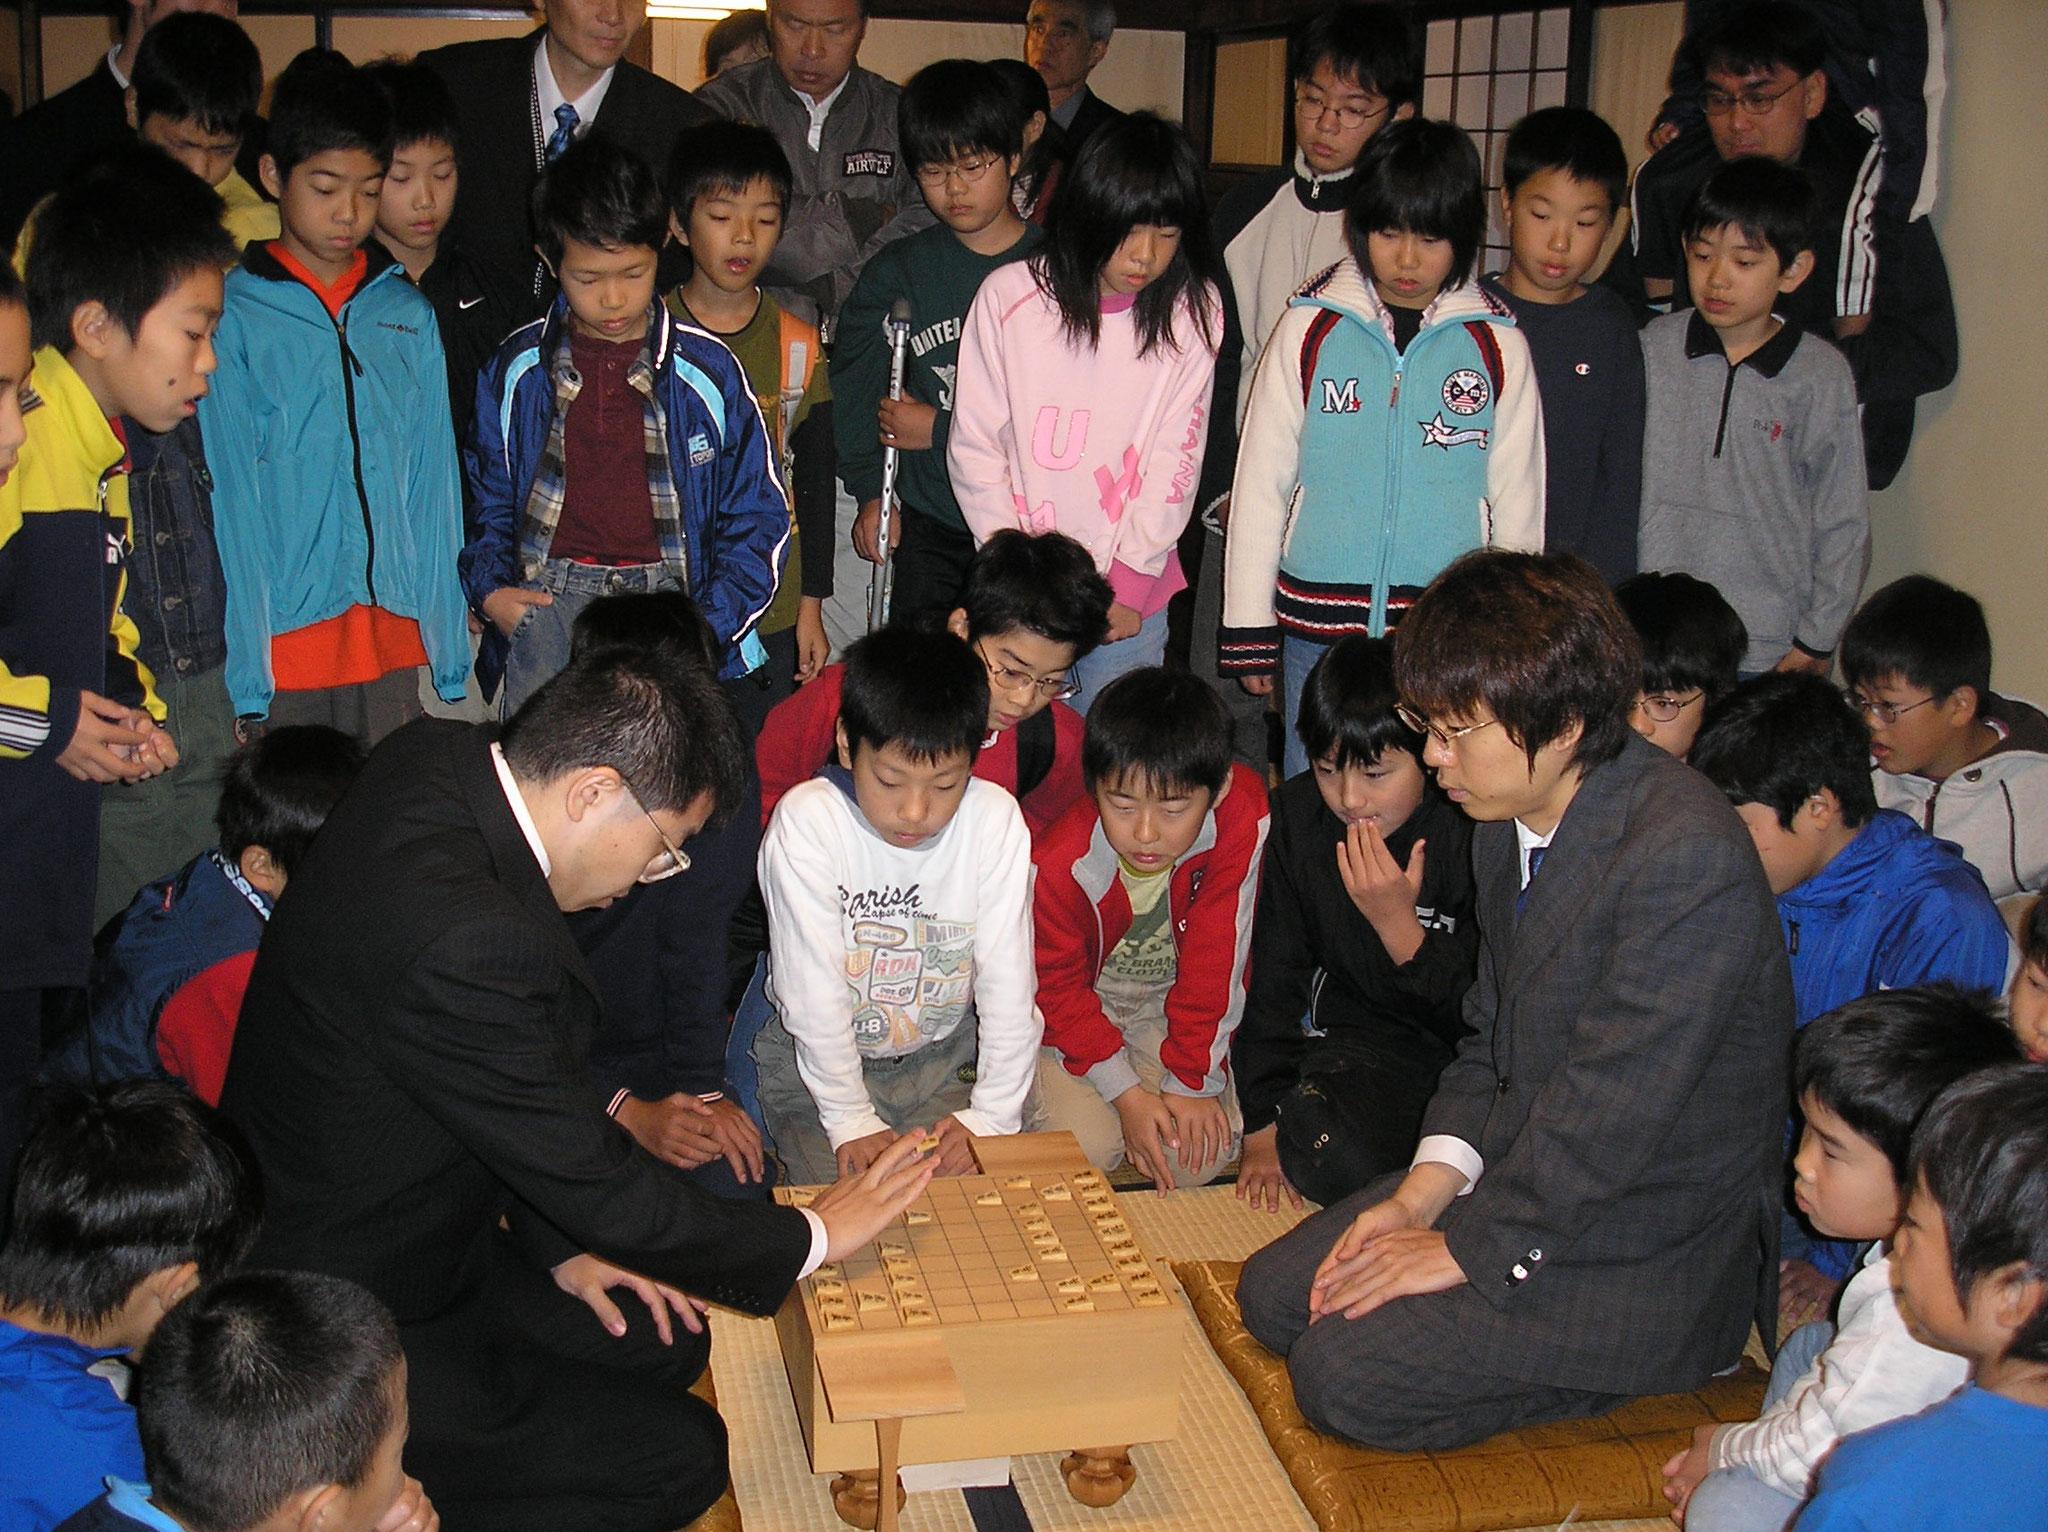 2006年11月 模範対局 勝又先生と